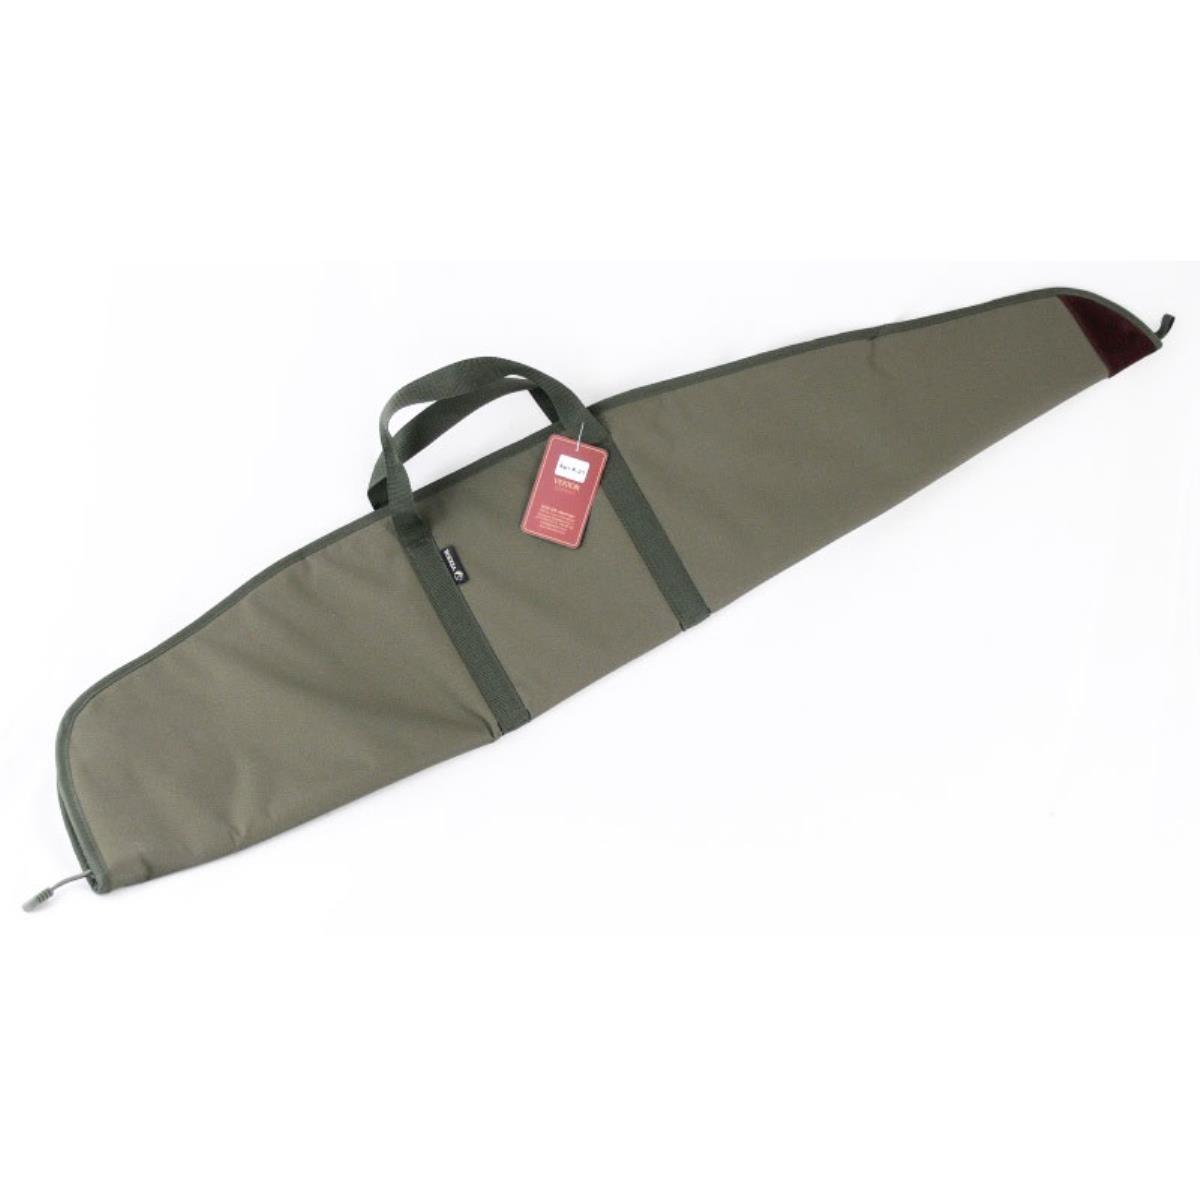 Funda Capron con mira para rifle con óptica, longitud 119 cm Vektor K-21